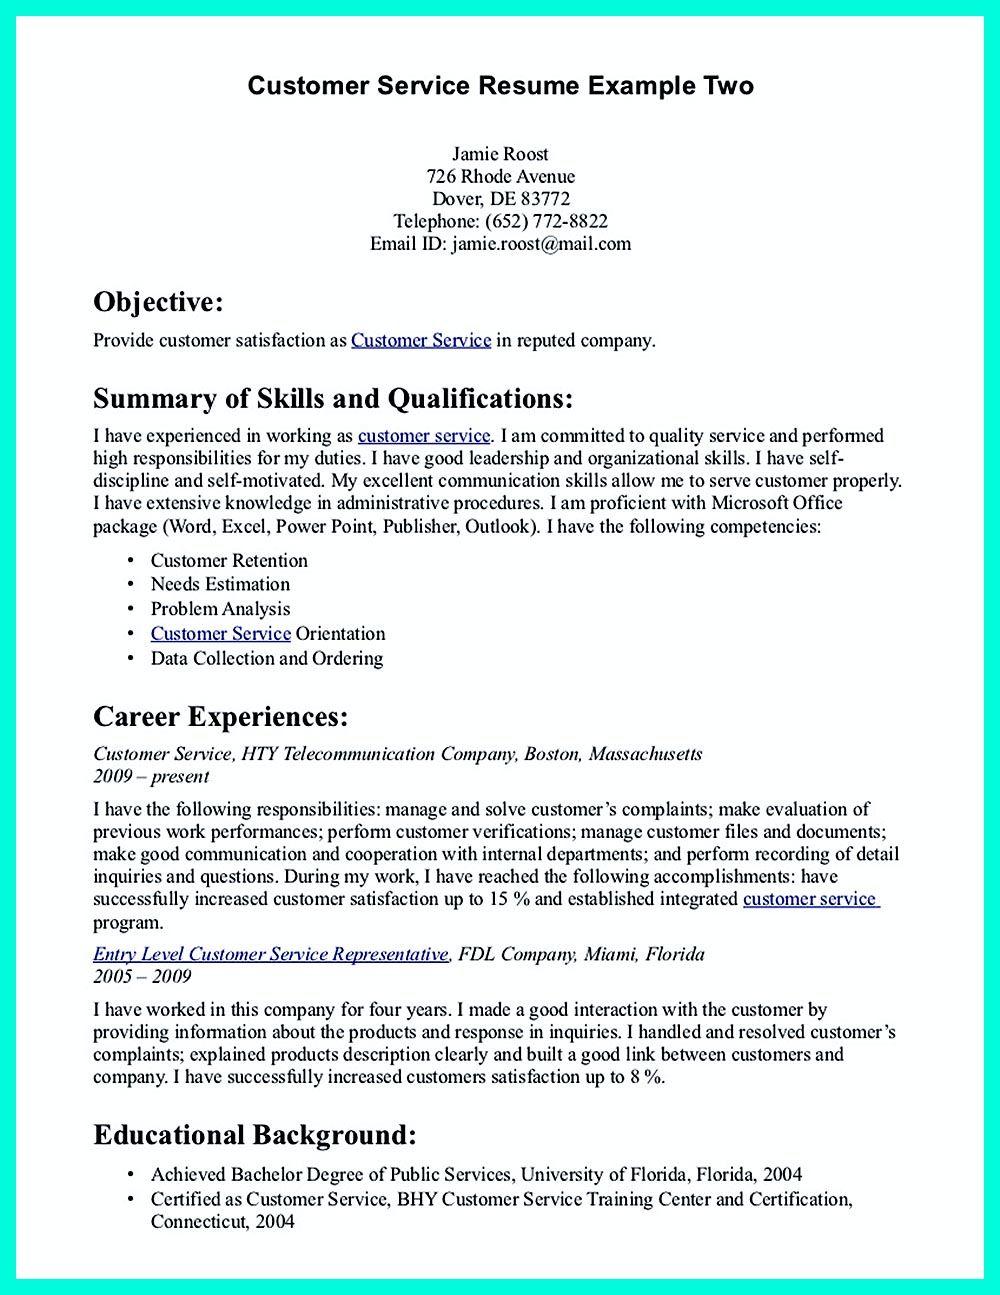 Skills For Resume Customer Service